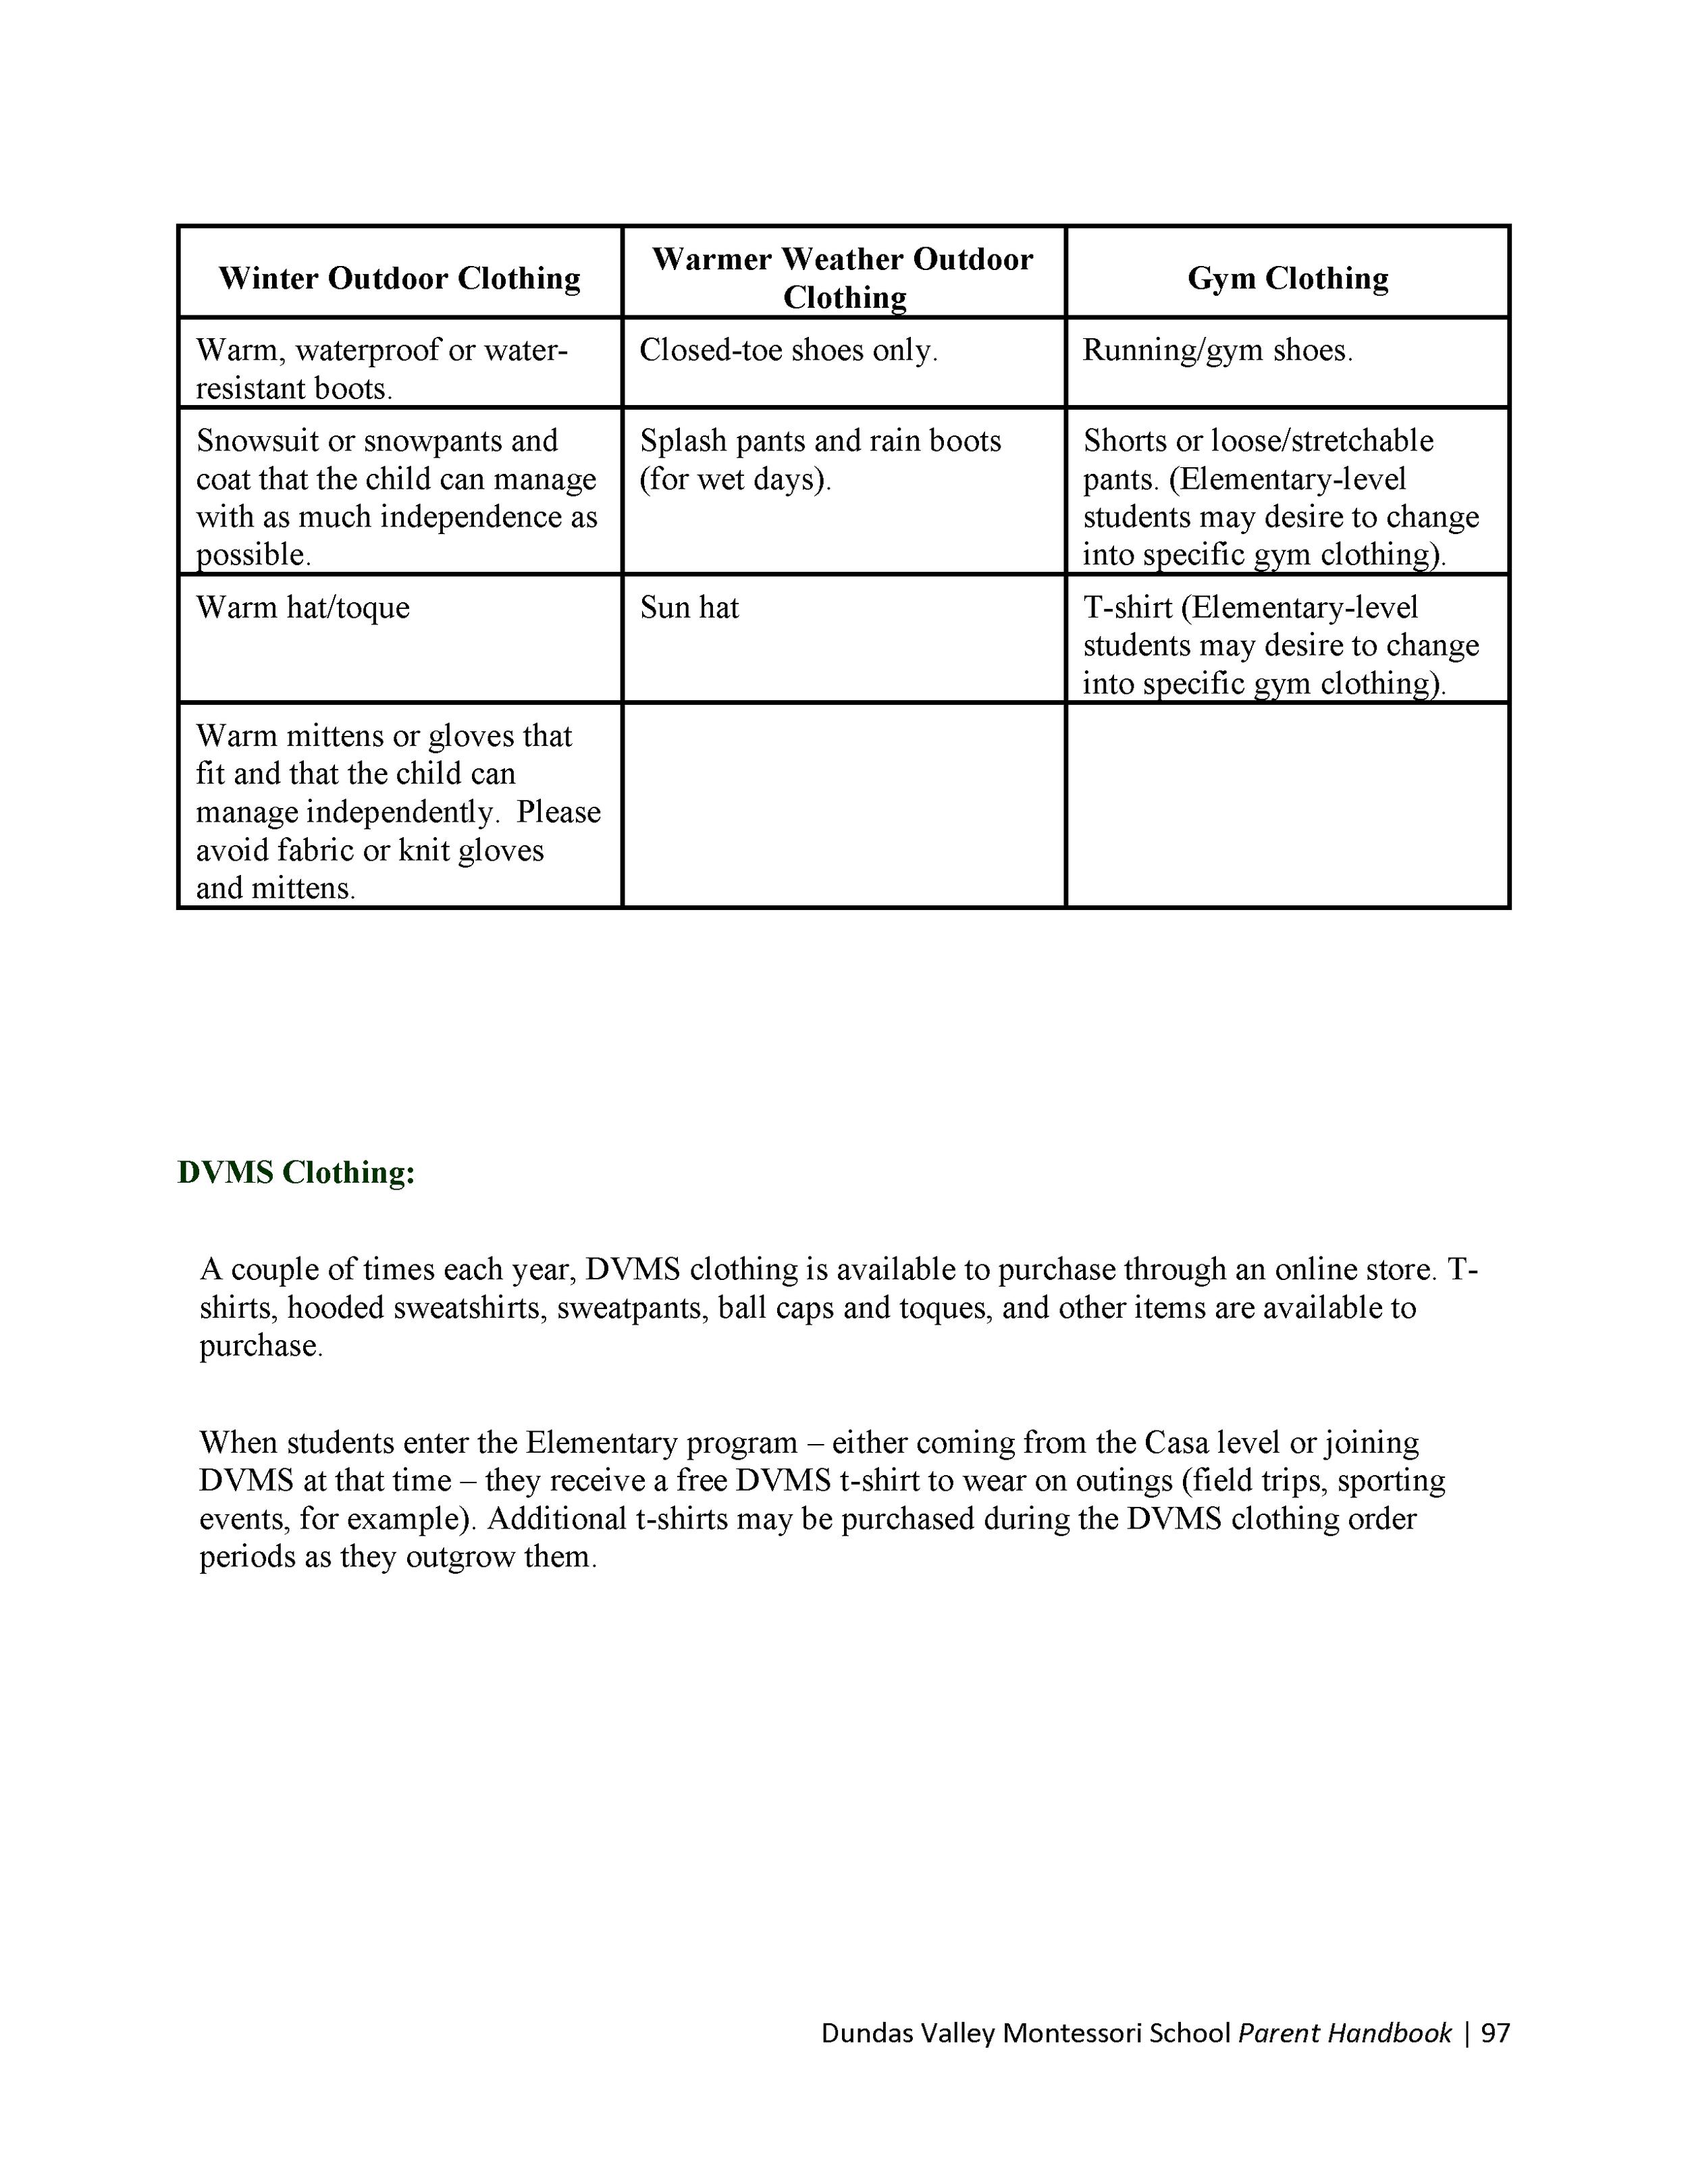 DVMS-Parent-Handbook-19-20_Page_099.png